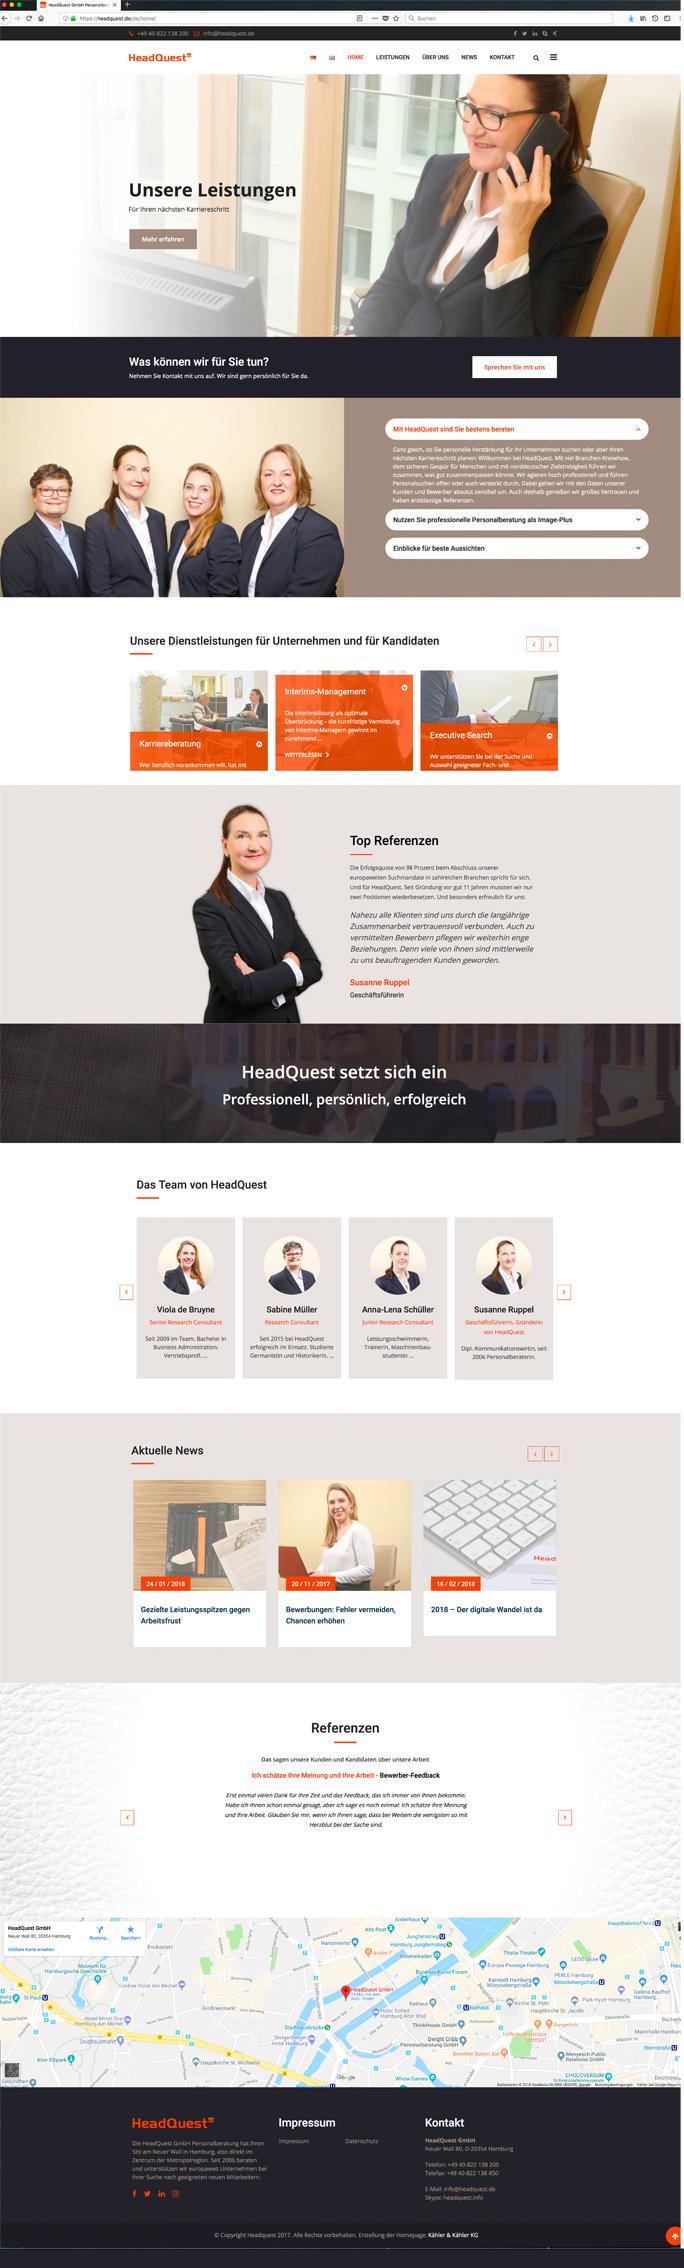 HeadQuest GmbH Personalberatung